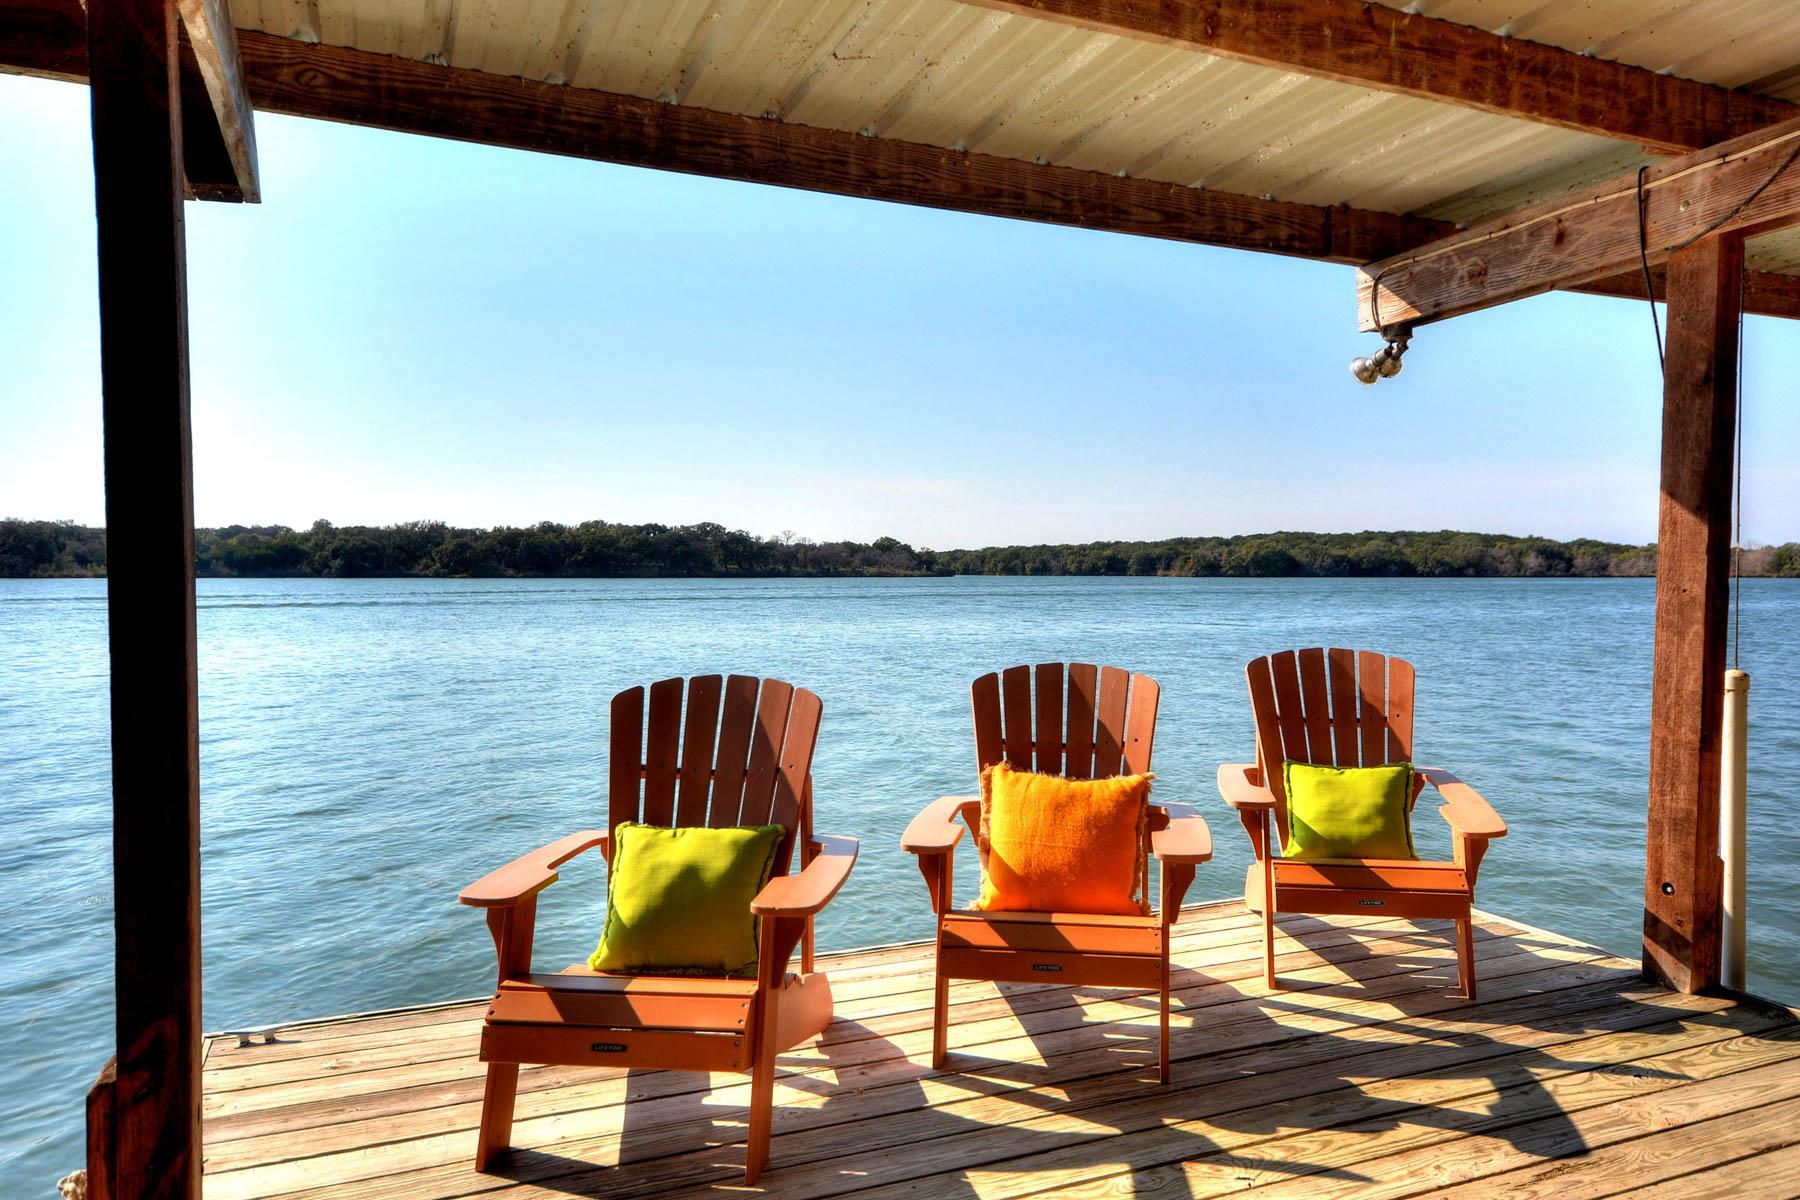 Single Family Home for Sale at Enjoy the Good Life on Lake LBJ 110 Circle Pt Kingsland, Texas 78639 United States